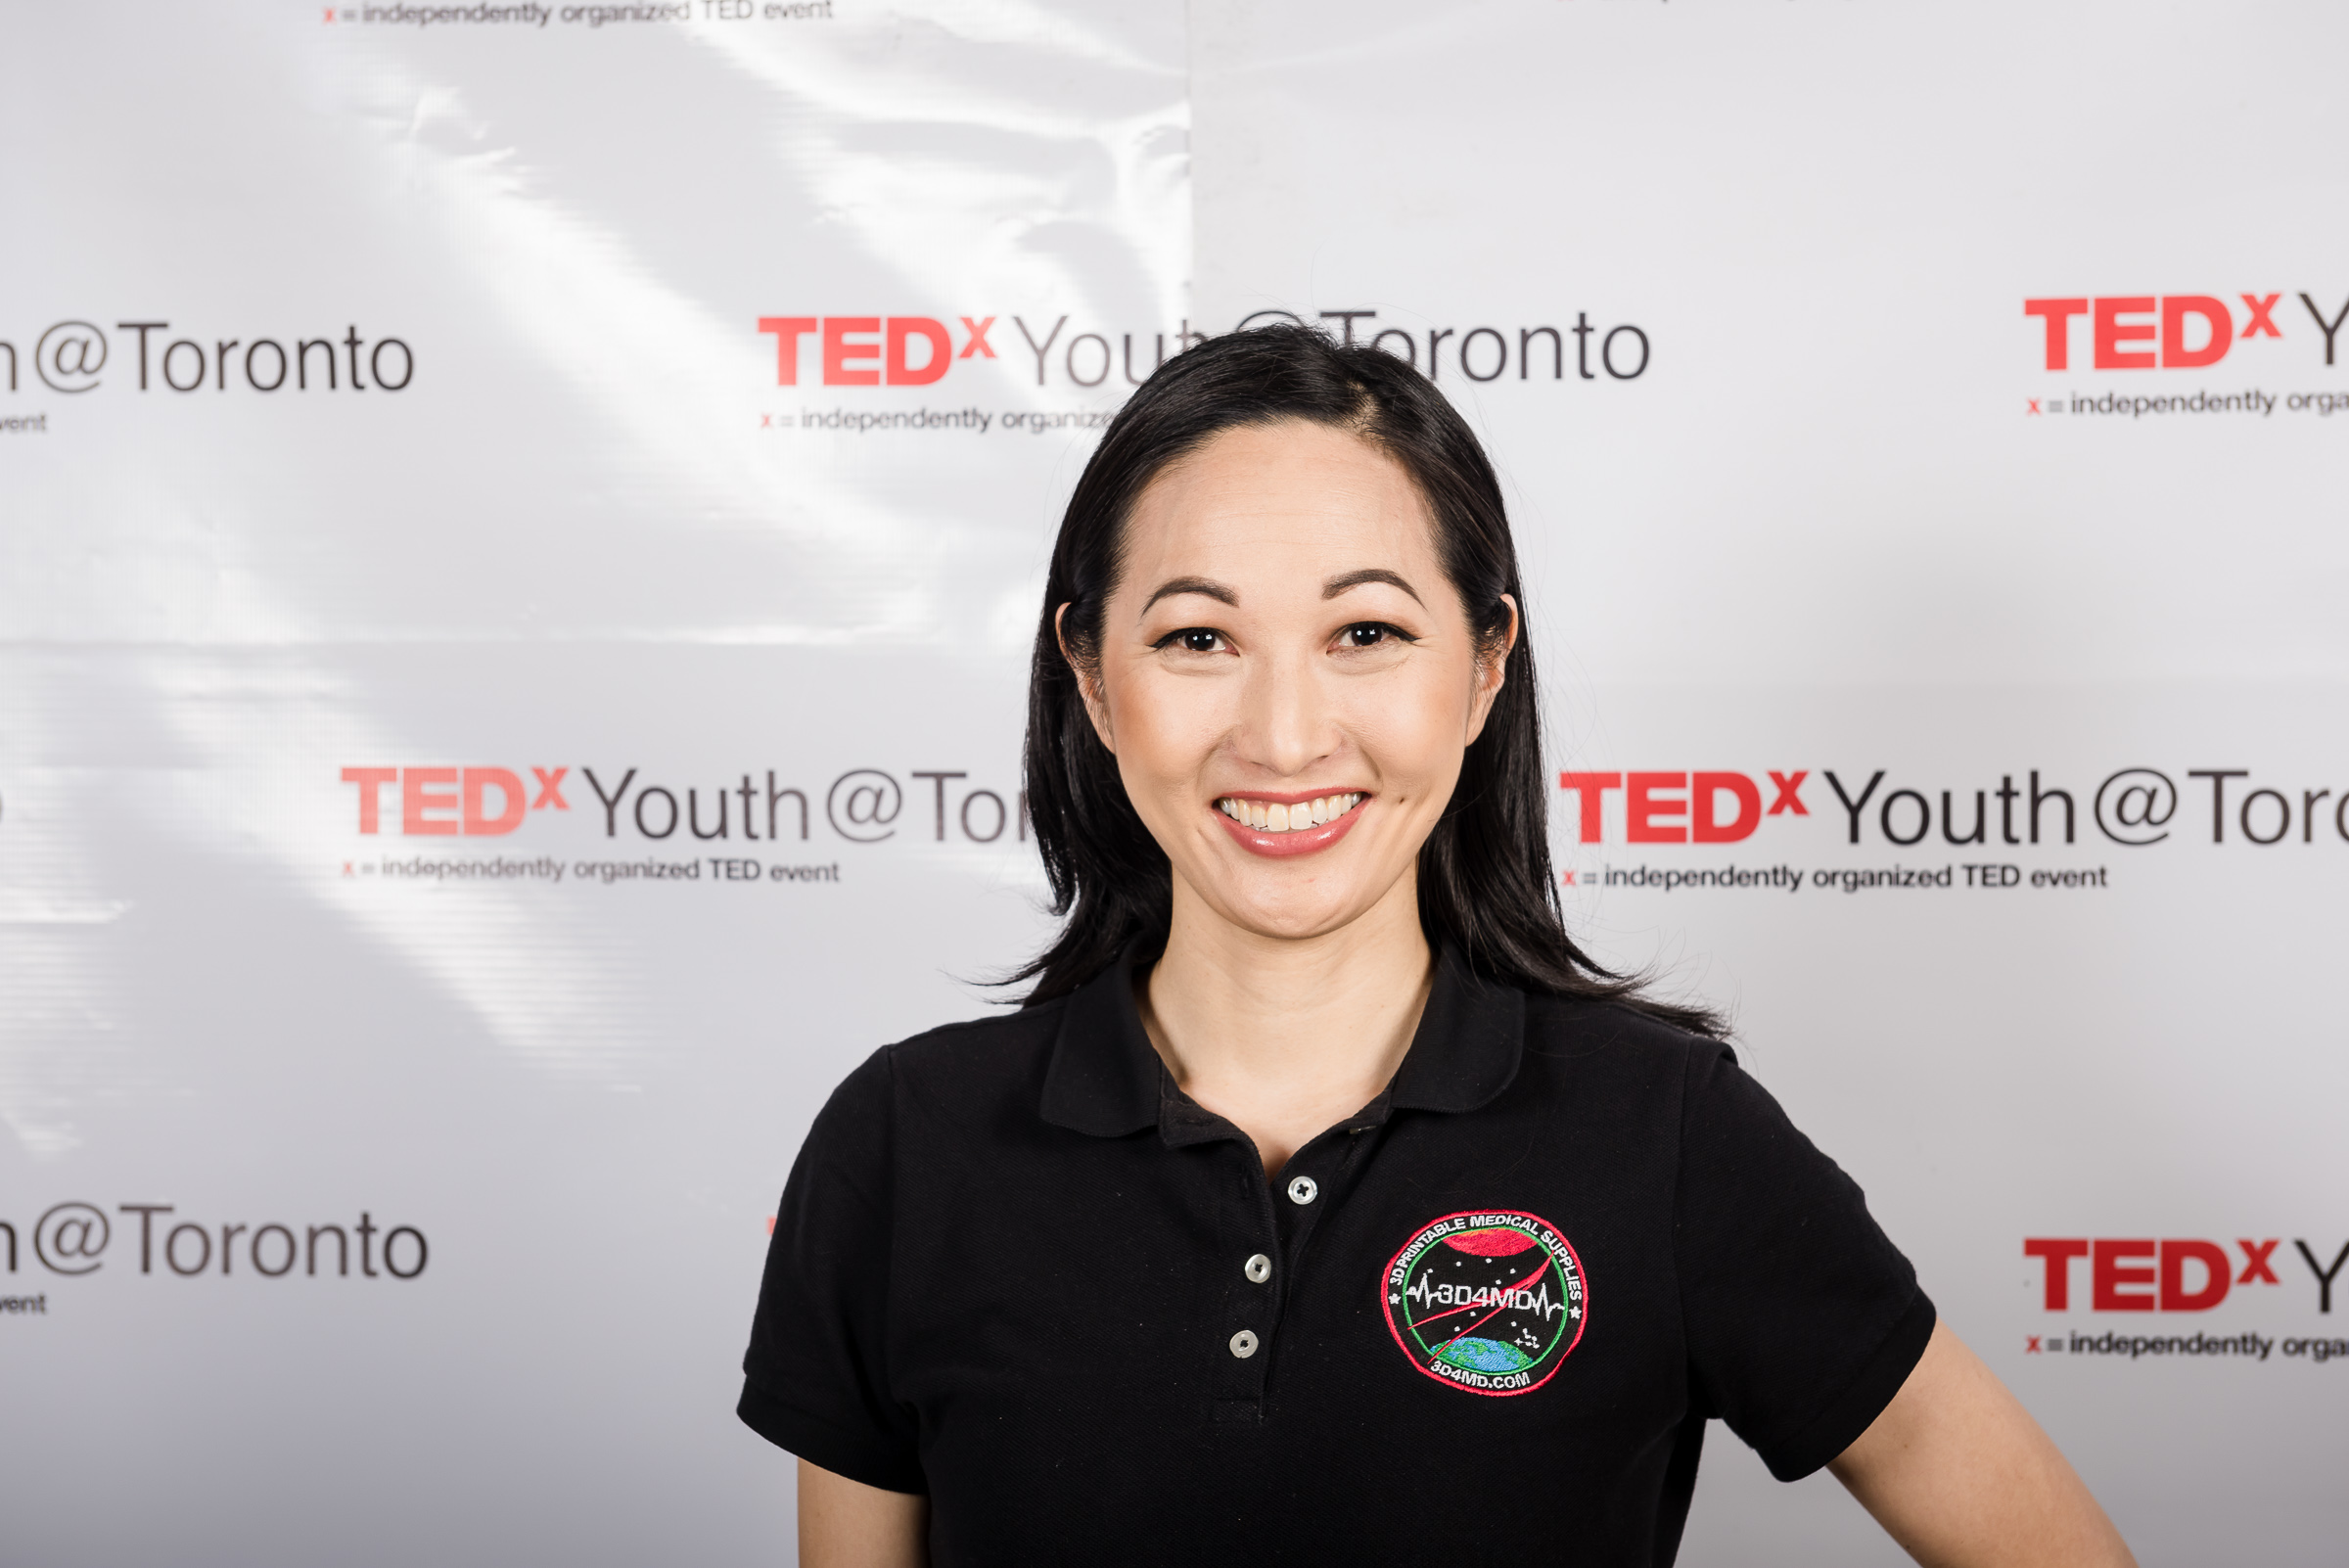 TEDx Youth Toronto Photo Op 3.jpg